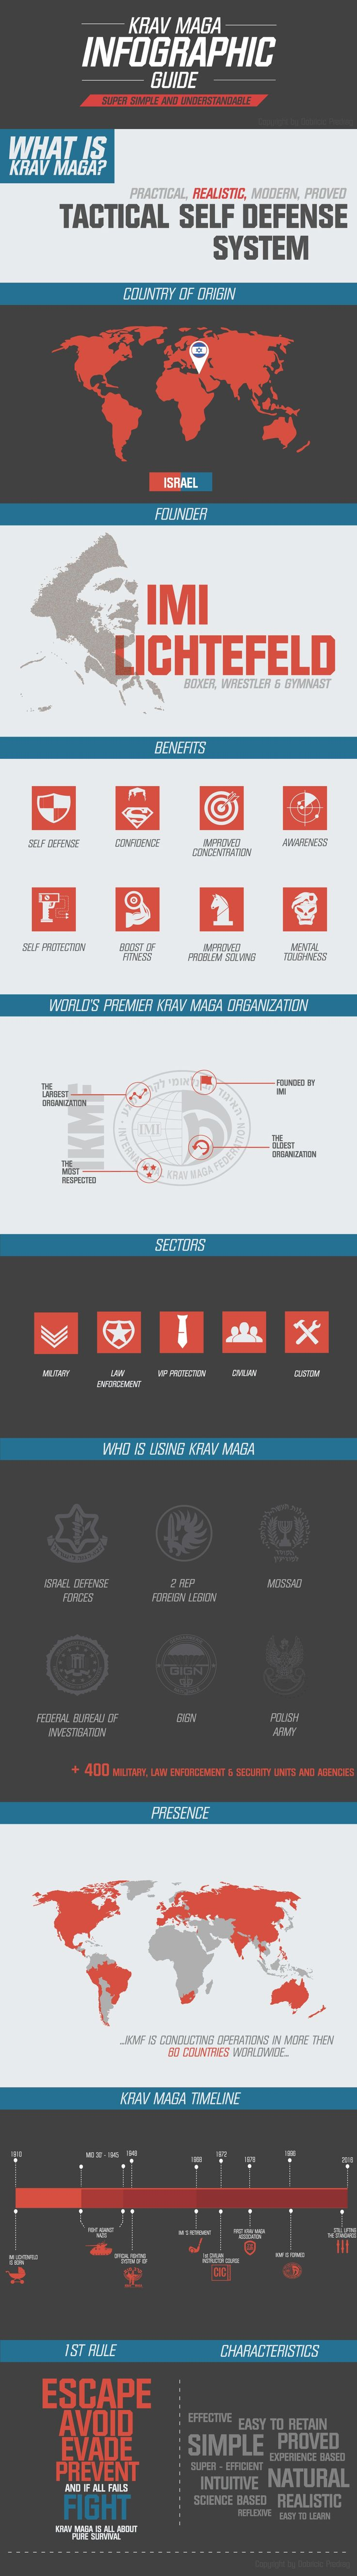 675 best krav maga images on pinterest marshal arts combat the best krav maga infographic yet buycottarizona